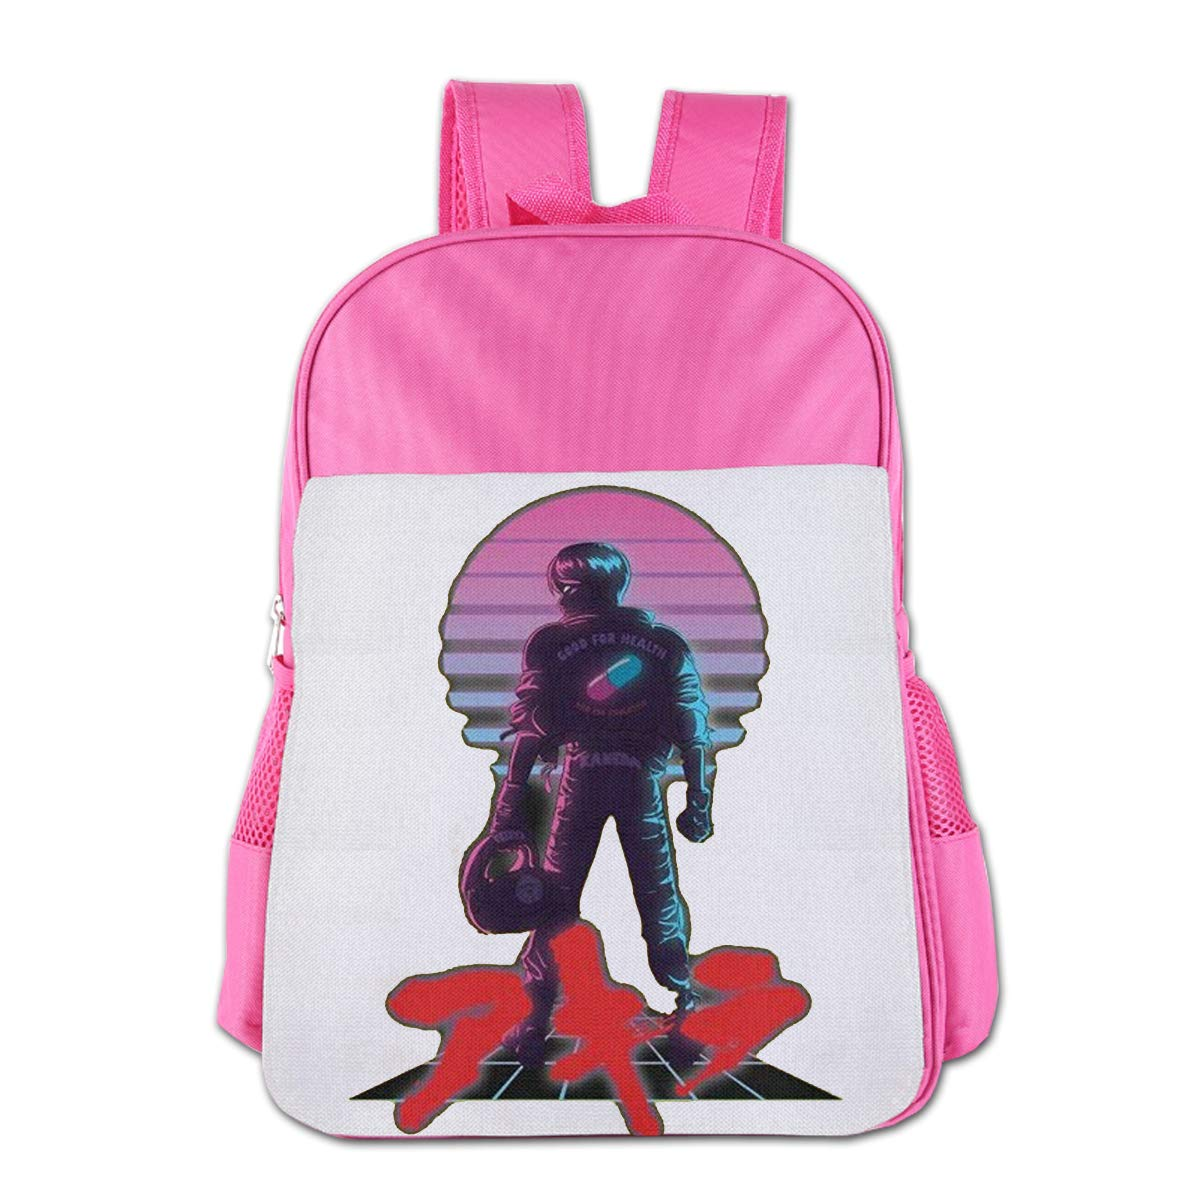 VAIJIAMAOYI 子供用スクールバッグ ヨーロッパとアメリカのパーソナリティ Akira - 80年代風 カネダ 子供用スクールバッグ ブルー One Size ピンク B07NQB5TYW